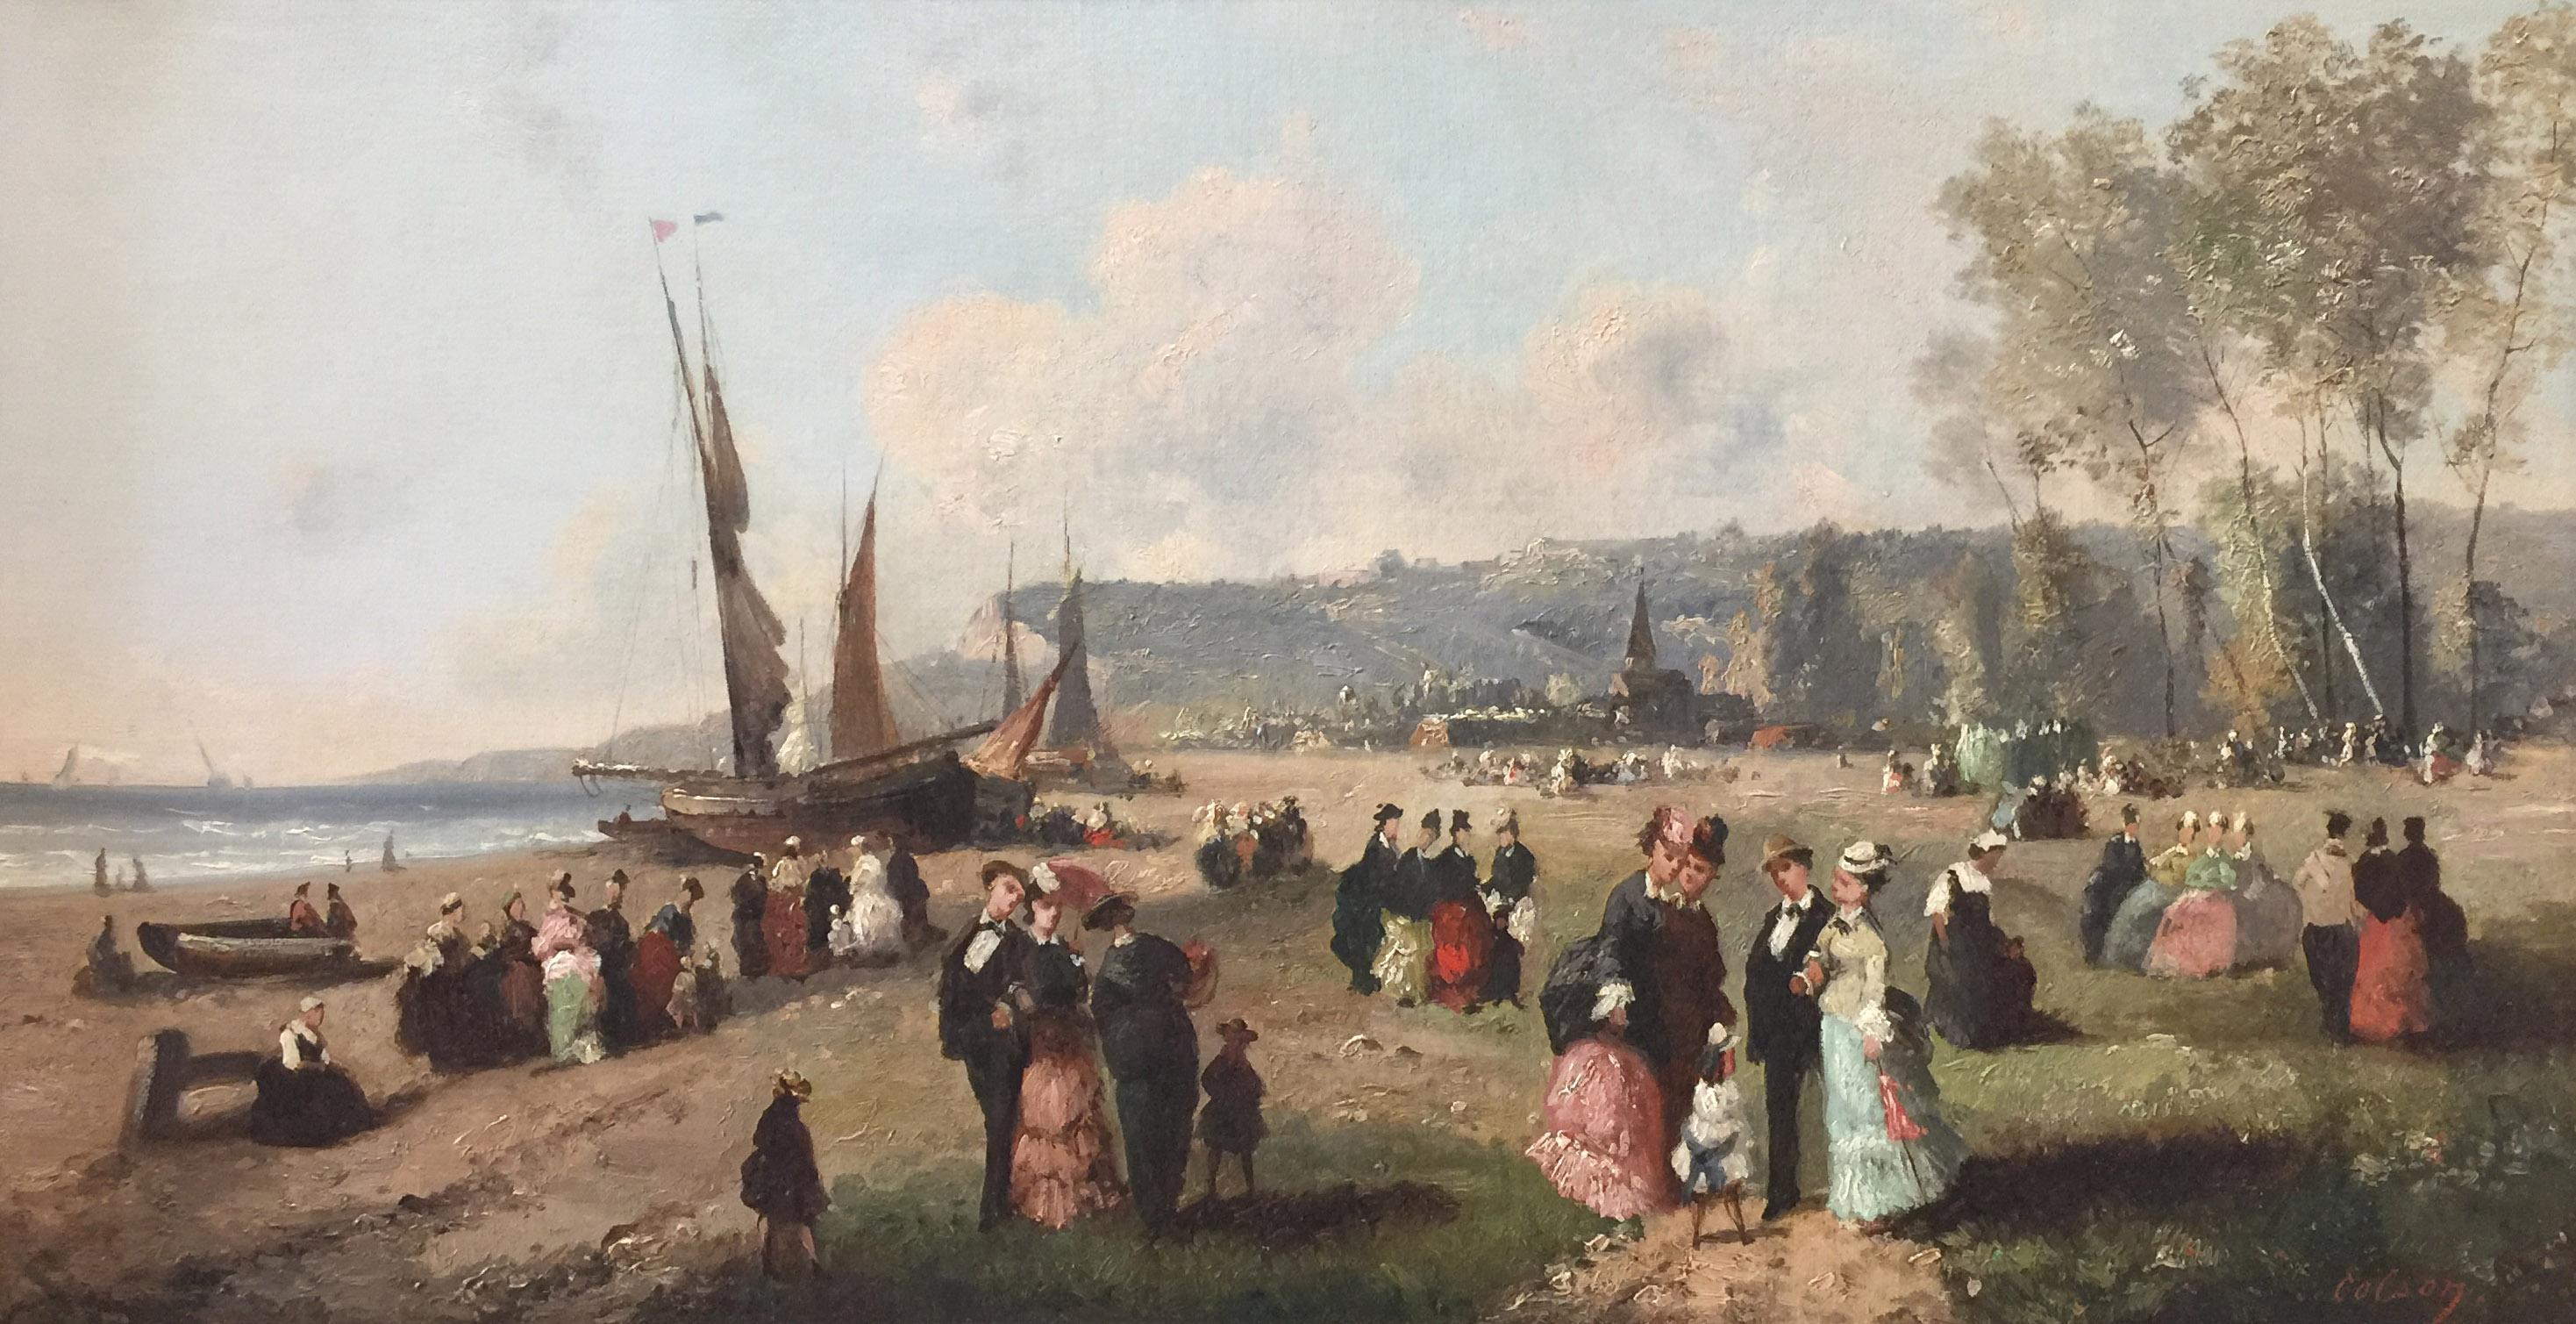 Guillaume-François Colson - Sur la plage, french, beach, 19th century, painting